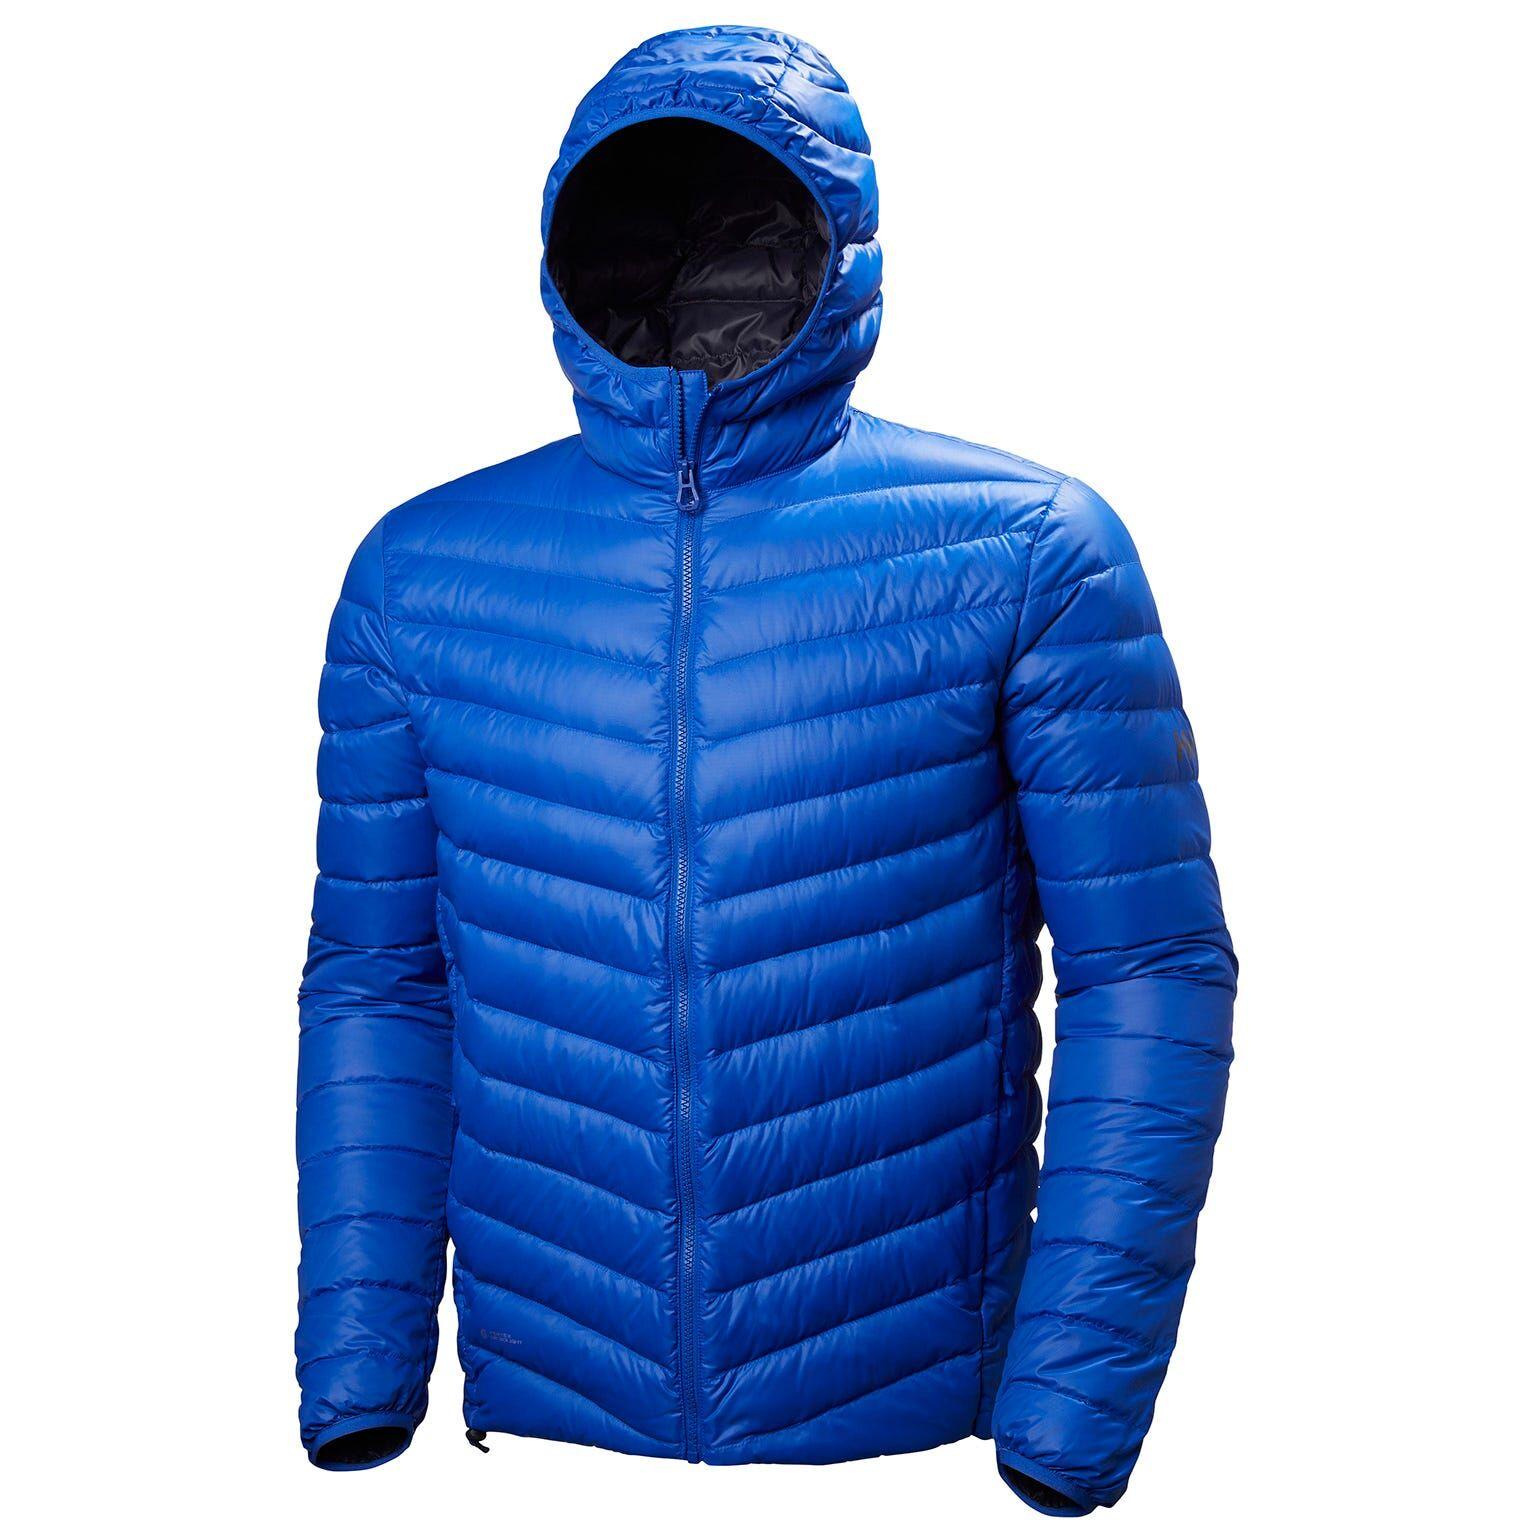 Helly Hansen Verglas Hooded Down Insulator Mens Hiking Jacket Blue S